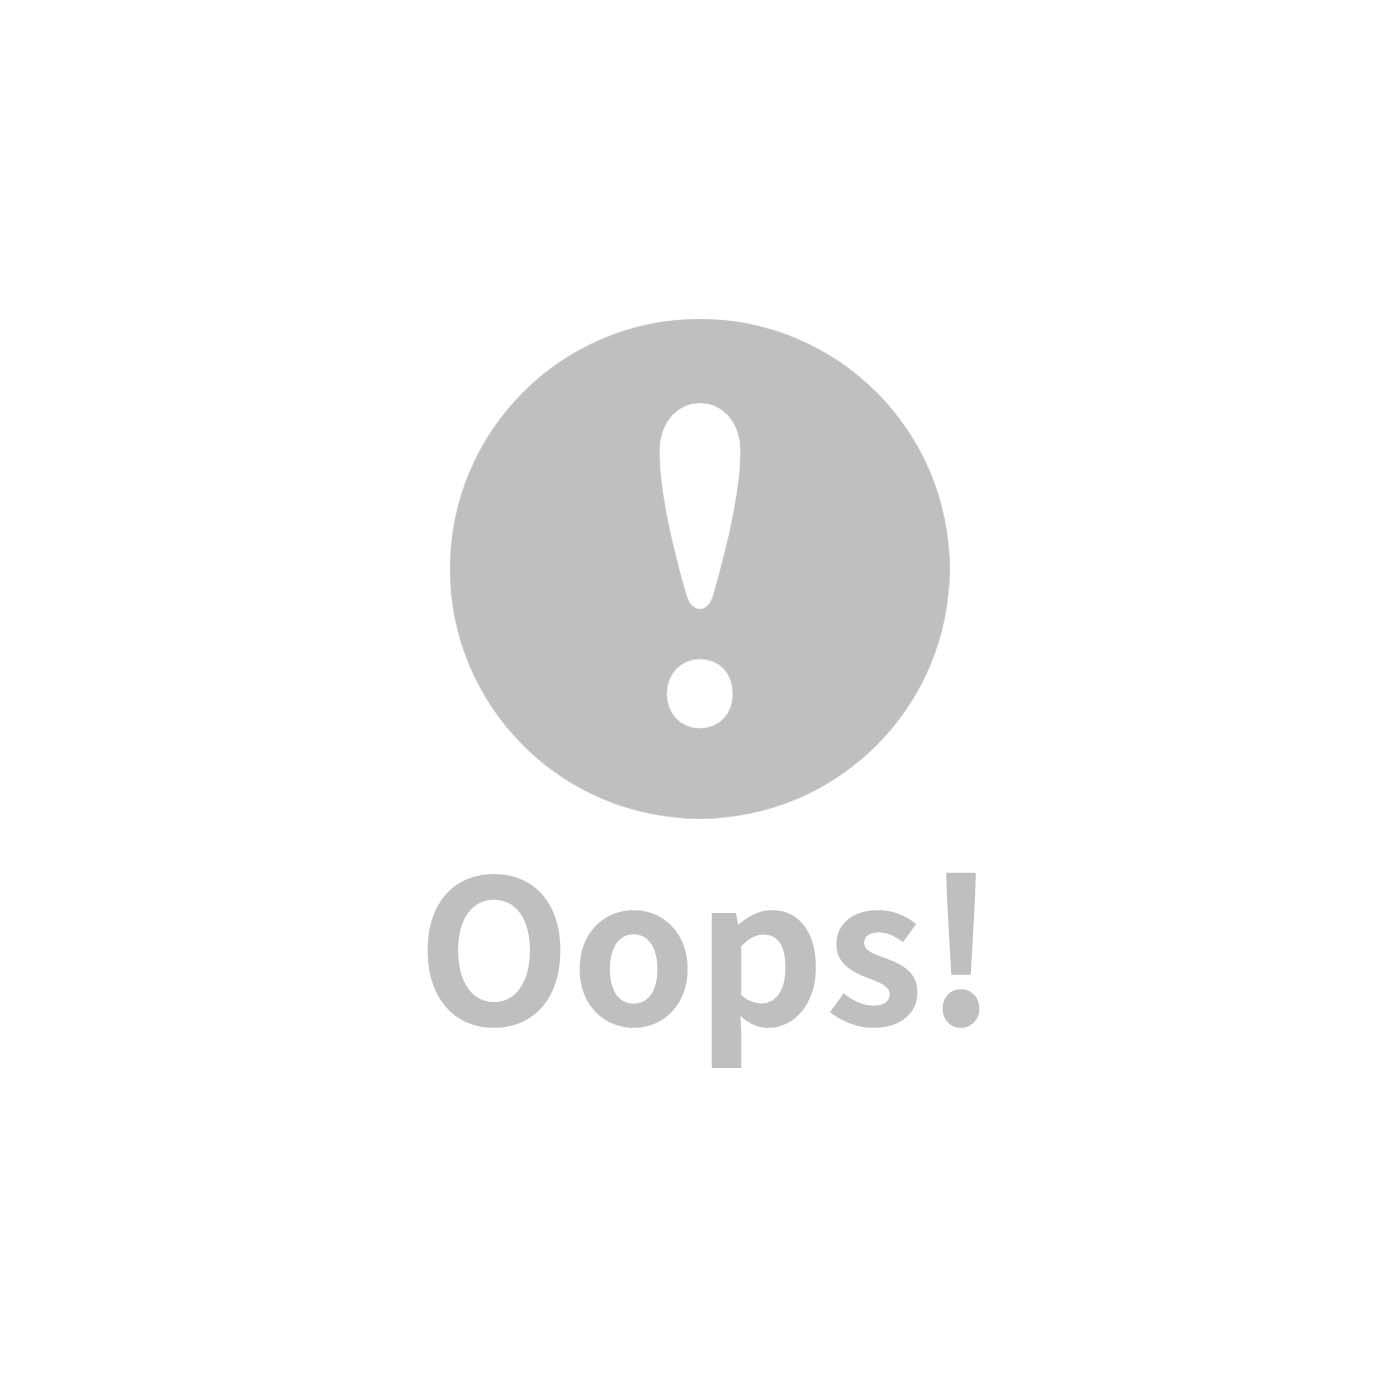 global affairs 童話手工編織安撫搖鈴_HERO系列(2入組)